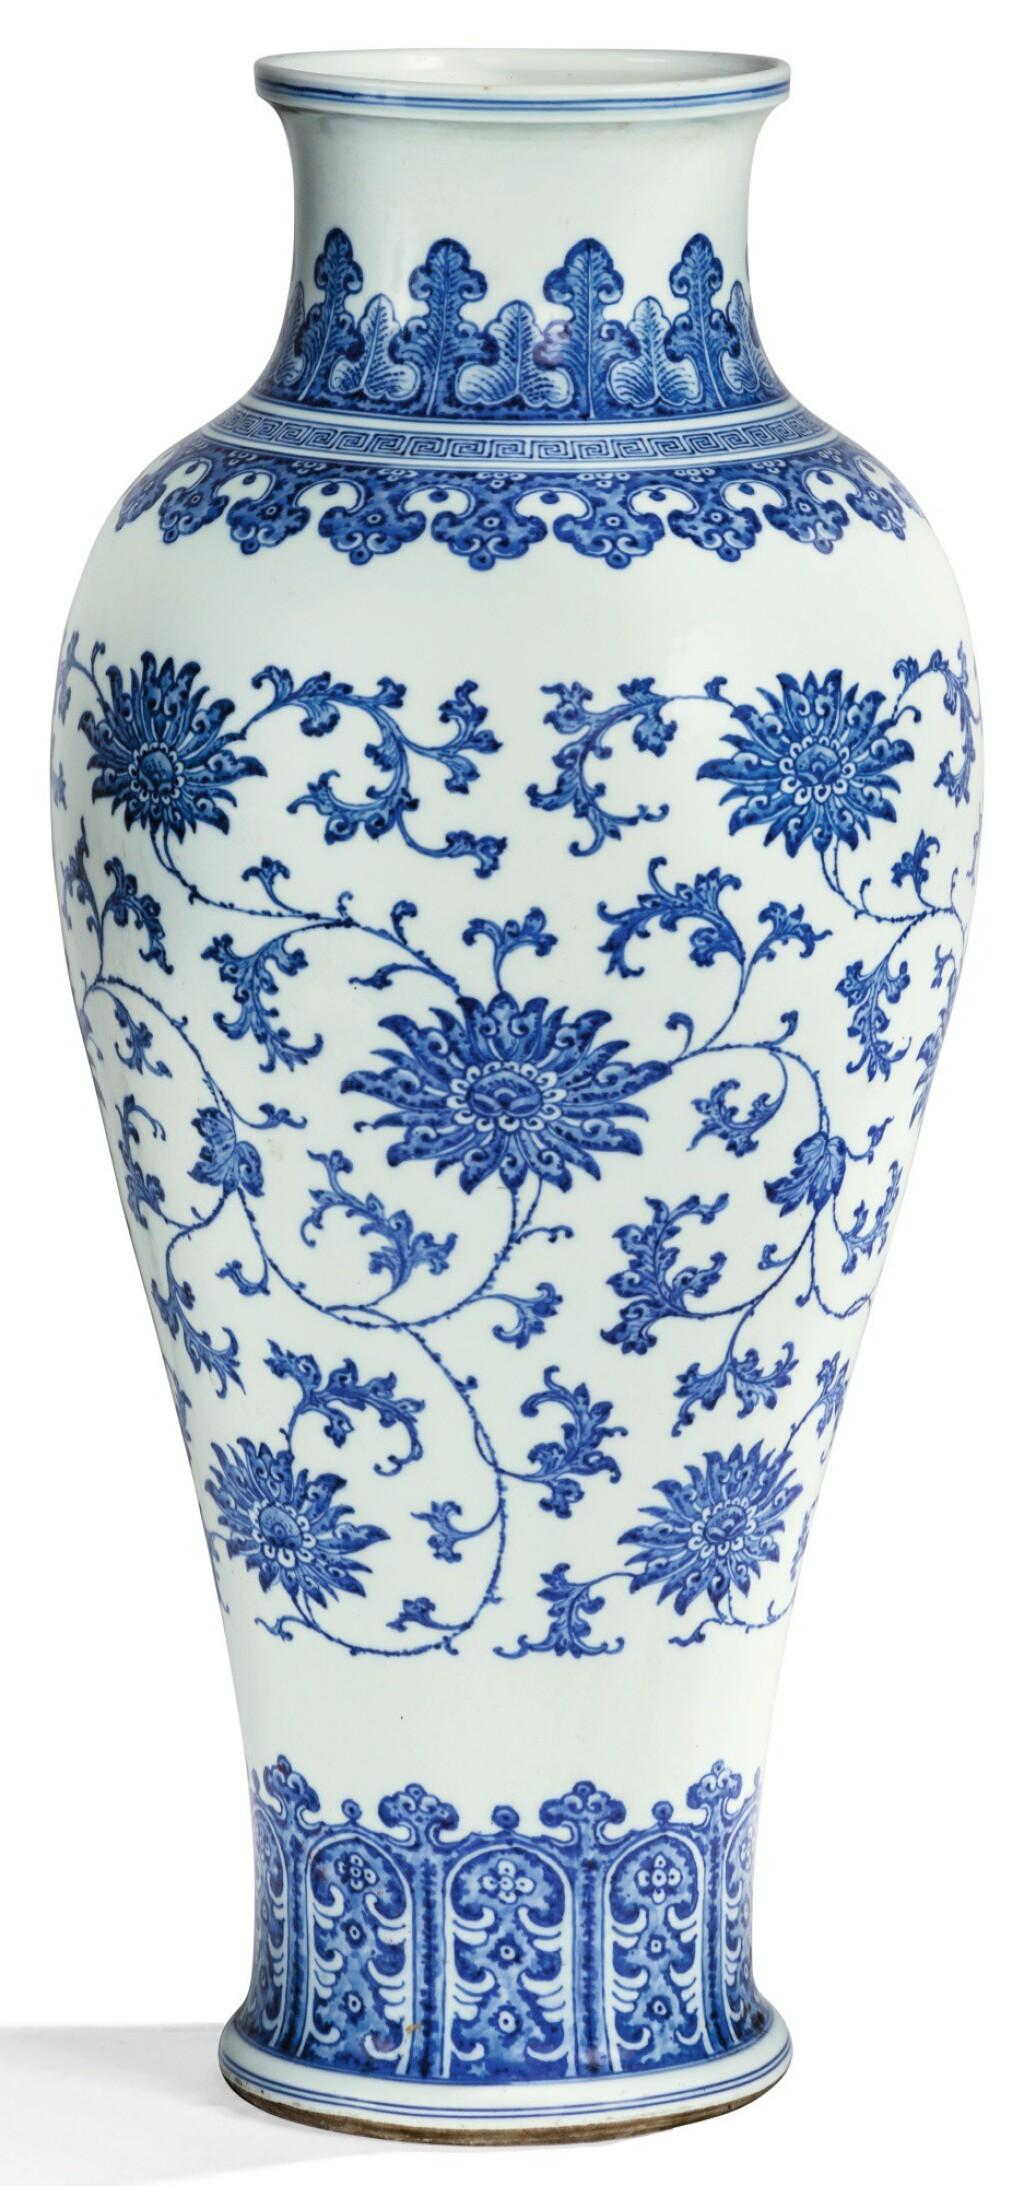 RARE GRAND VASE BALUSTRE EN PORCELAINE BLEU BLANC DYNASTIE QING, XVIIIE SIÈCLE | 清十八世紀 青花纏枝蓮紋觀音尊 | A rare large blue and white 'lotus' baluster vase, Qing Dynasty, 18th century